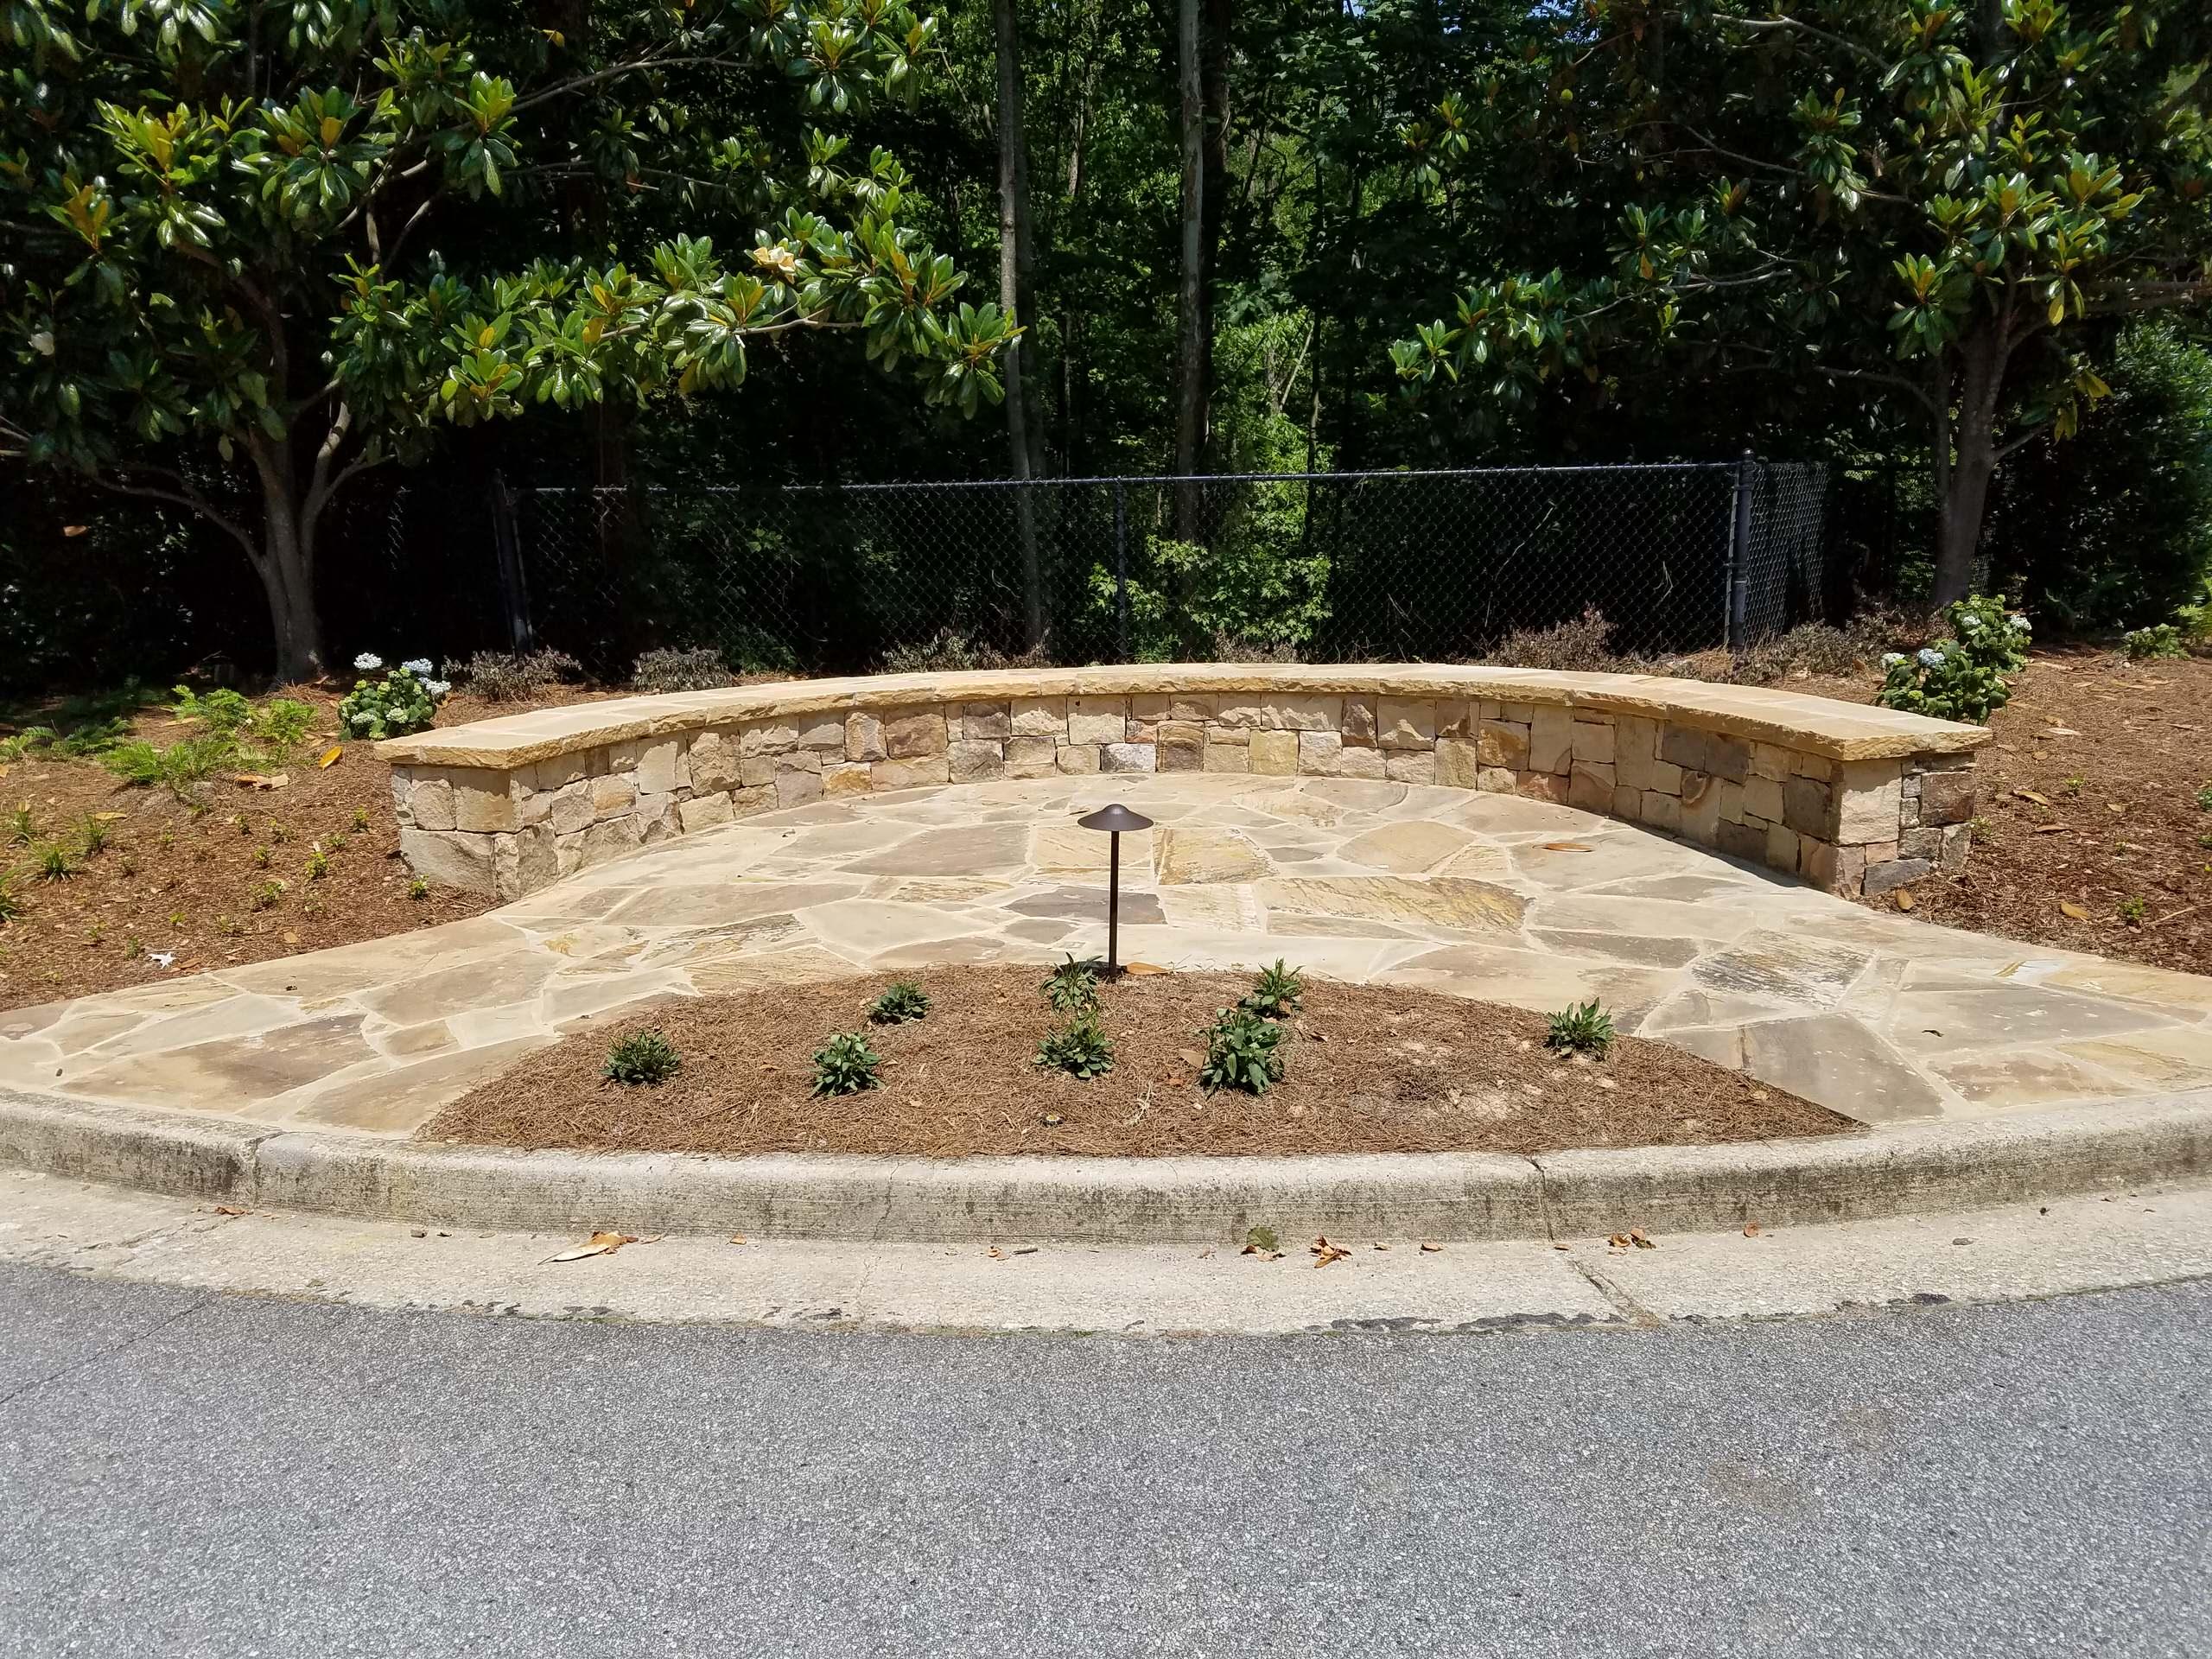 Stone seating area